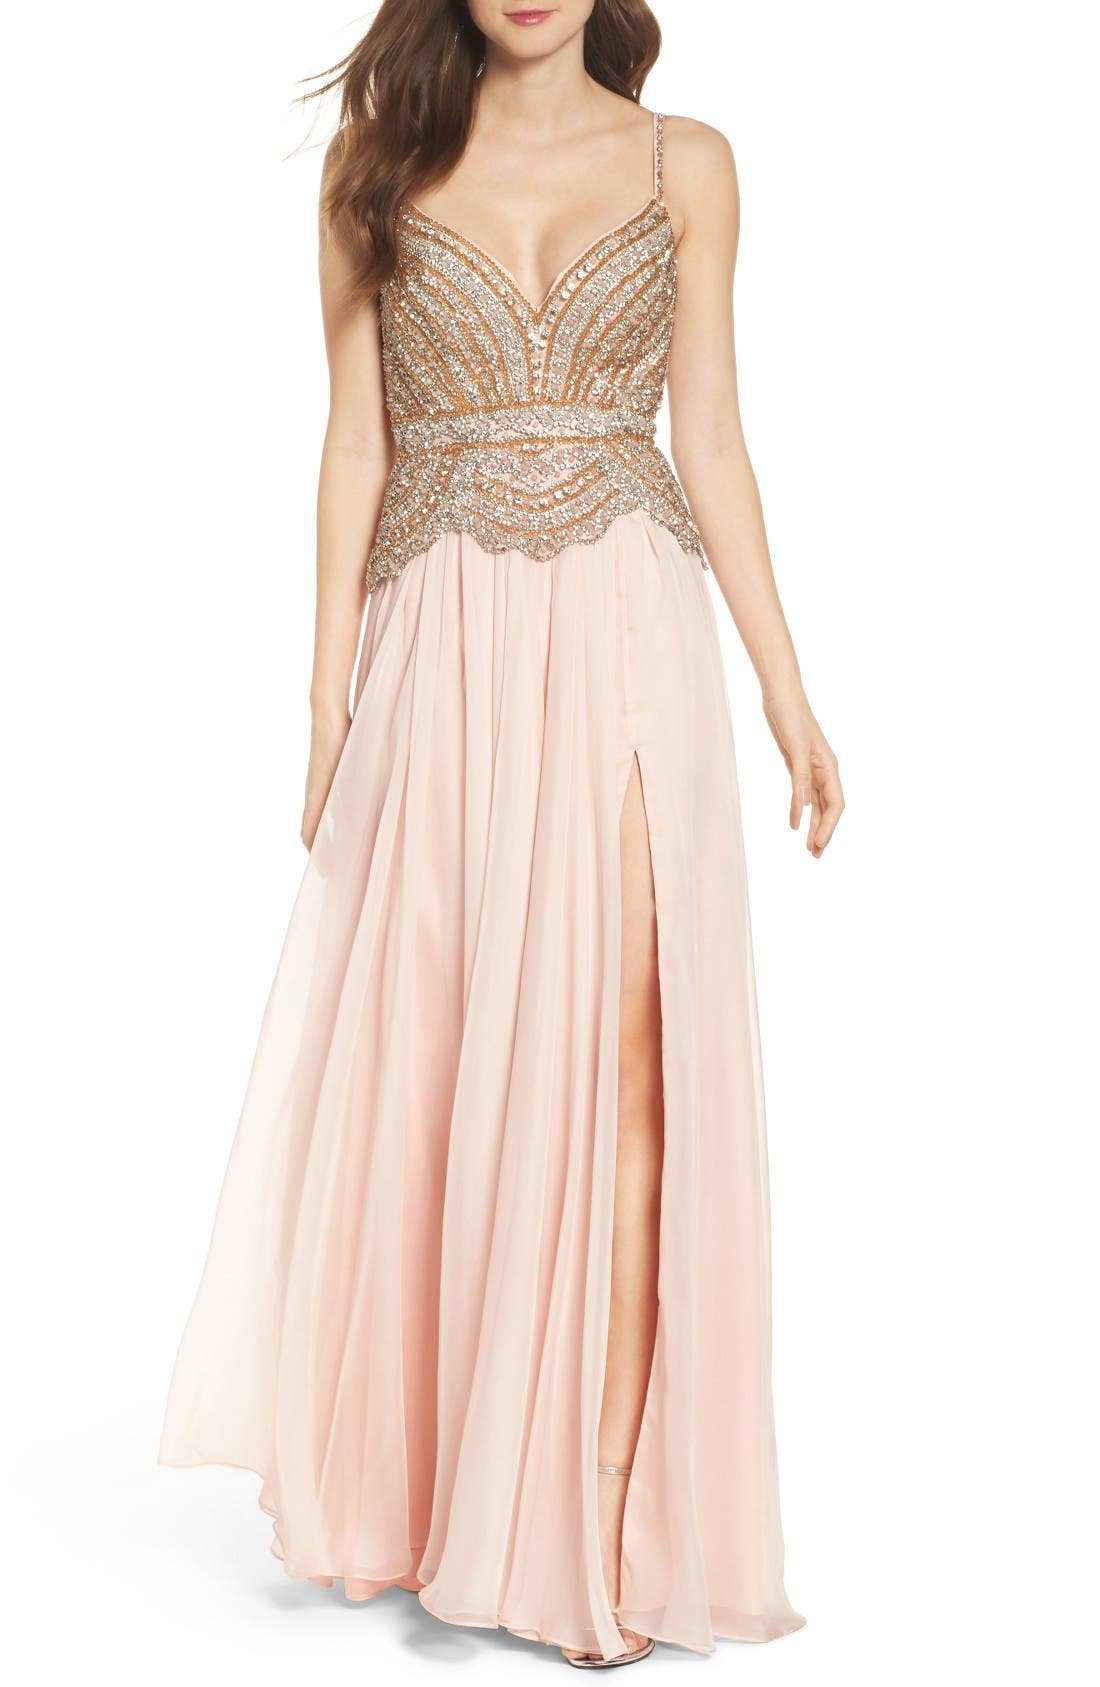 Main Image - Mac Duggal Rhinstone Bodice A-Line Chiffon Gown